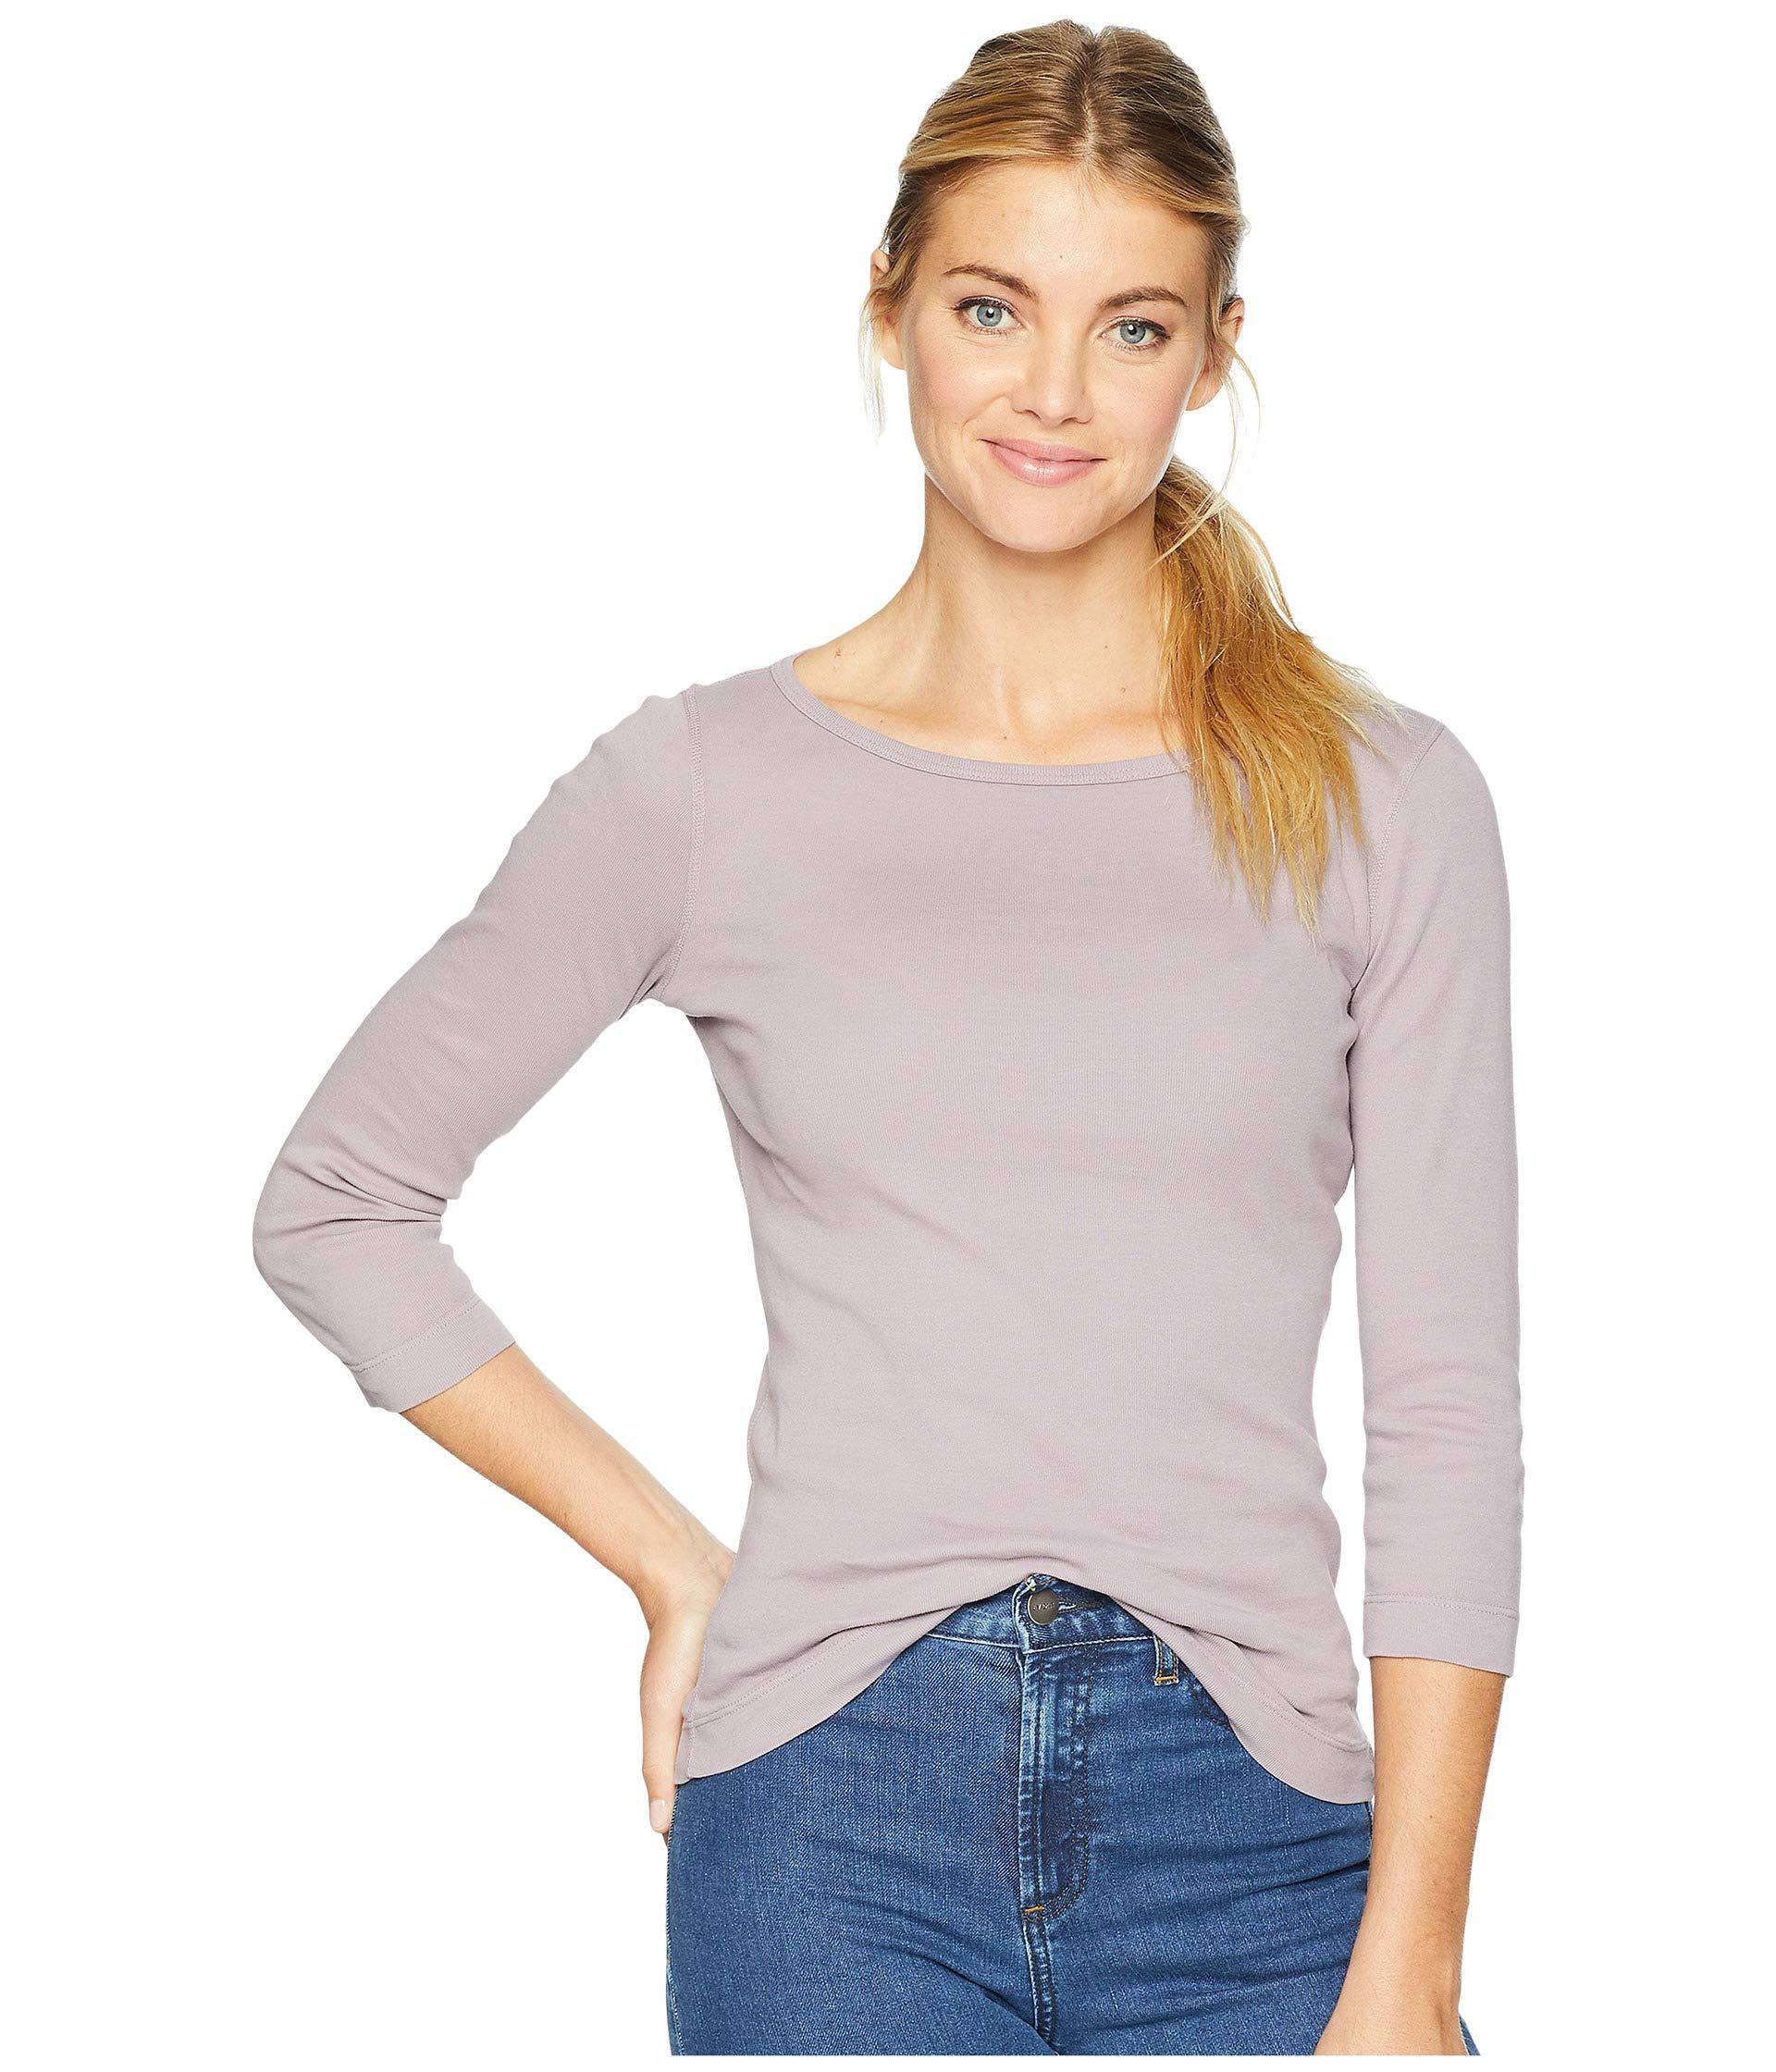 Mist Sleeve 3 Dots Knit 4 Heritage British Lilac 100 Three Cotton Tee pPXx0